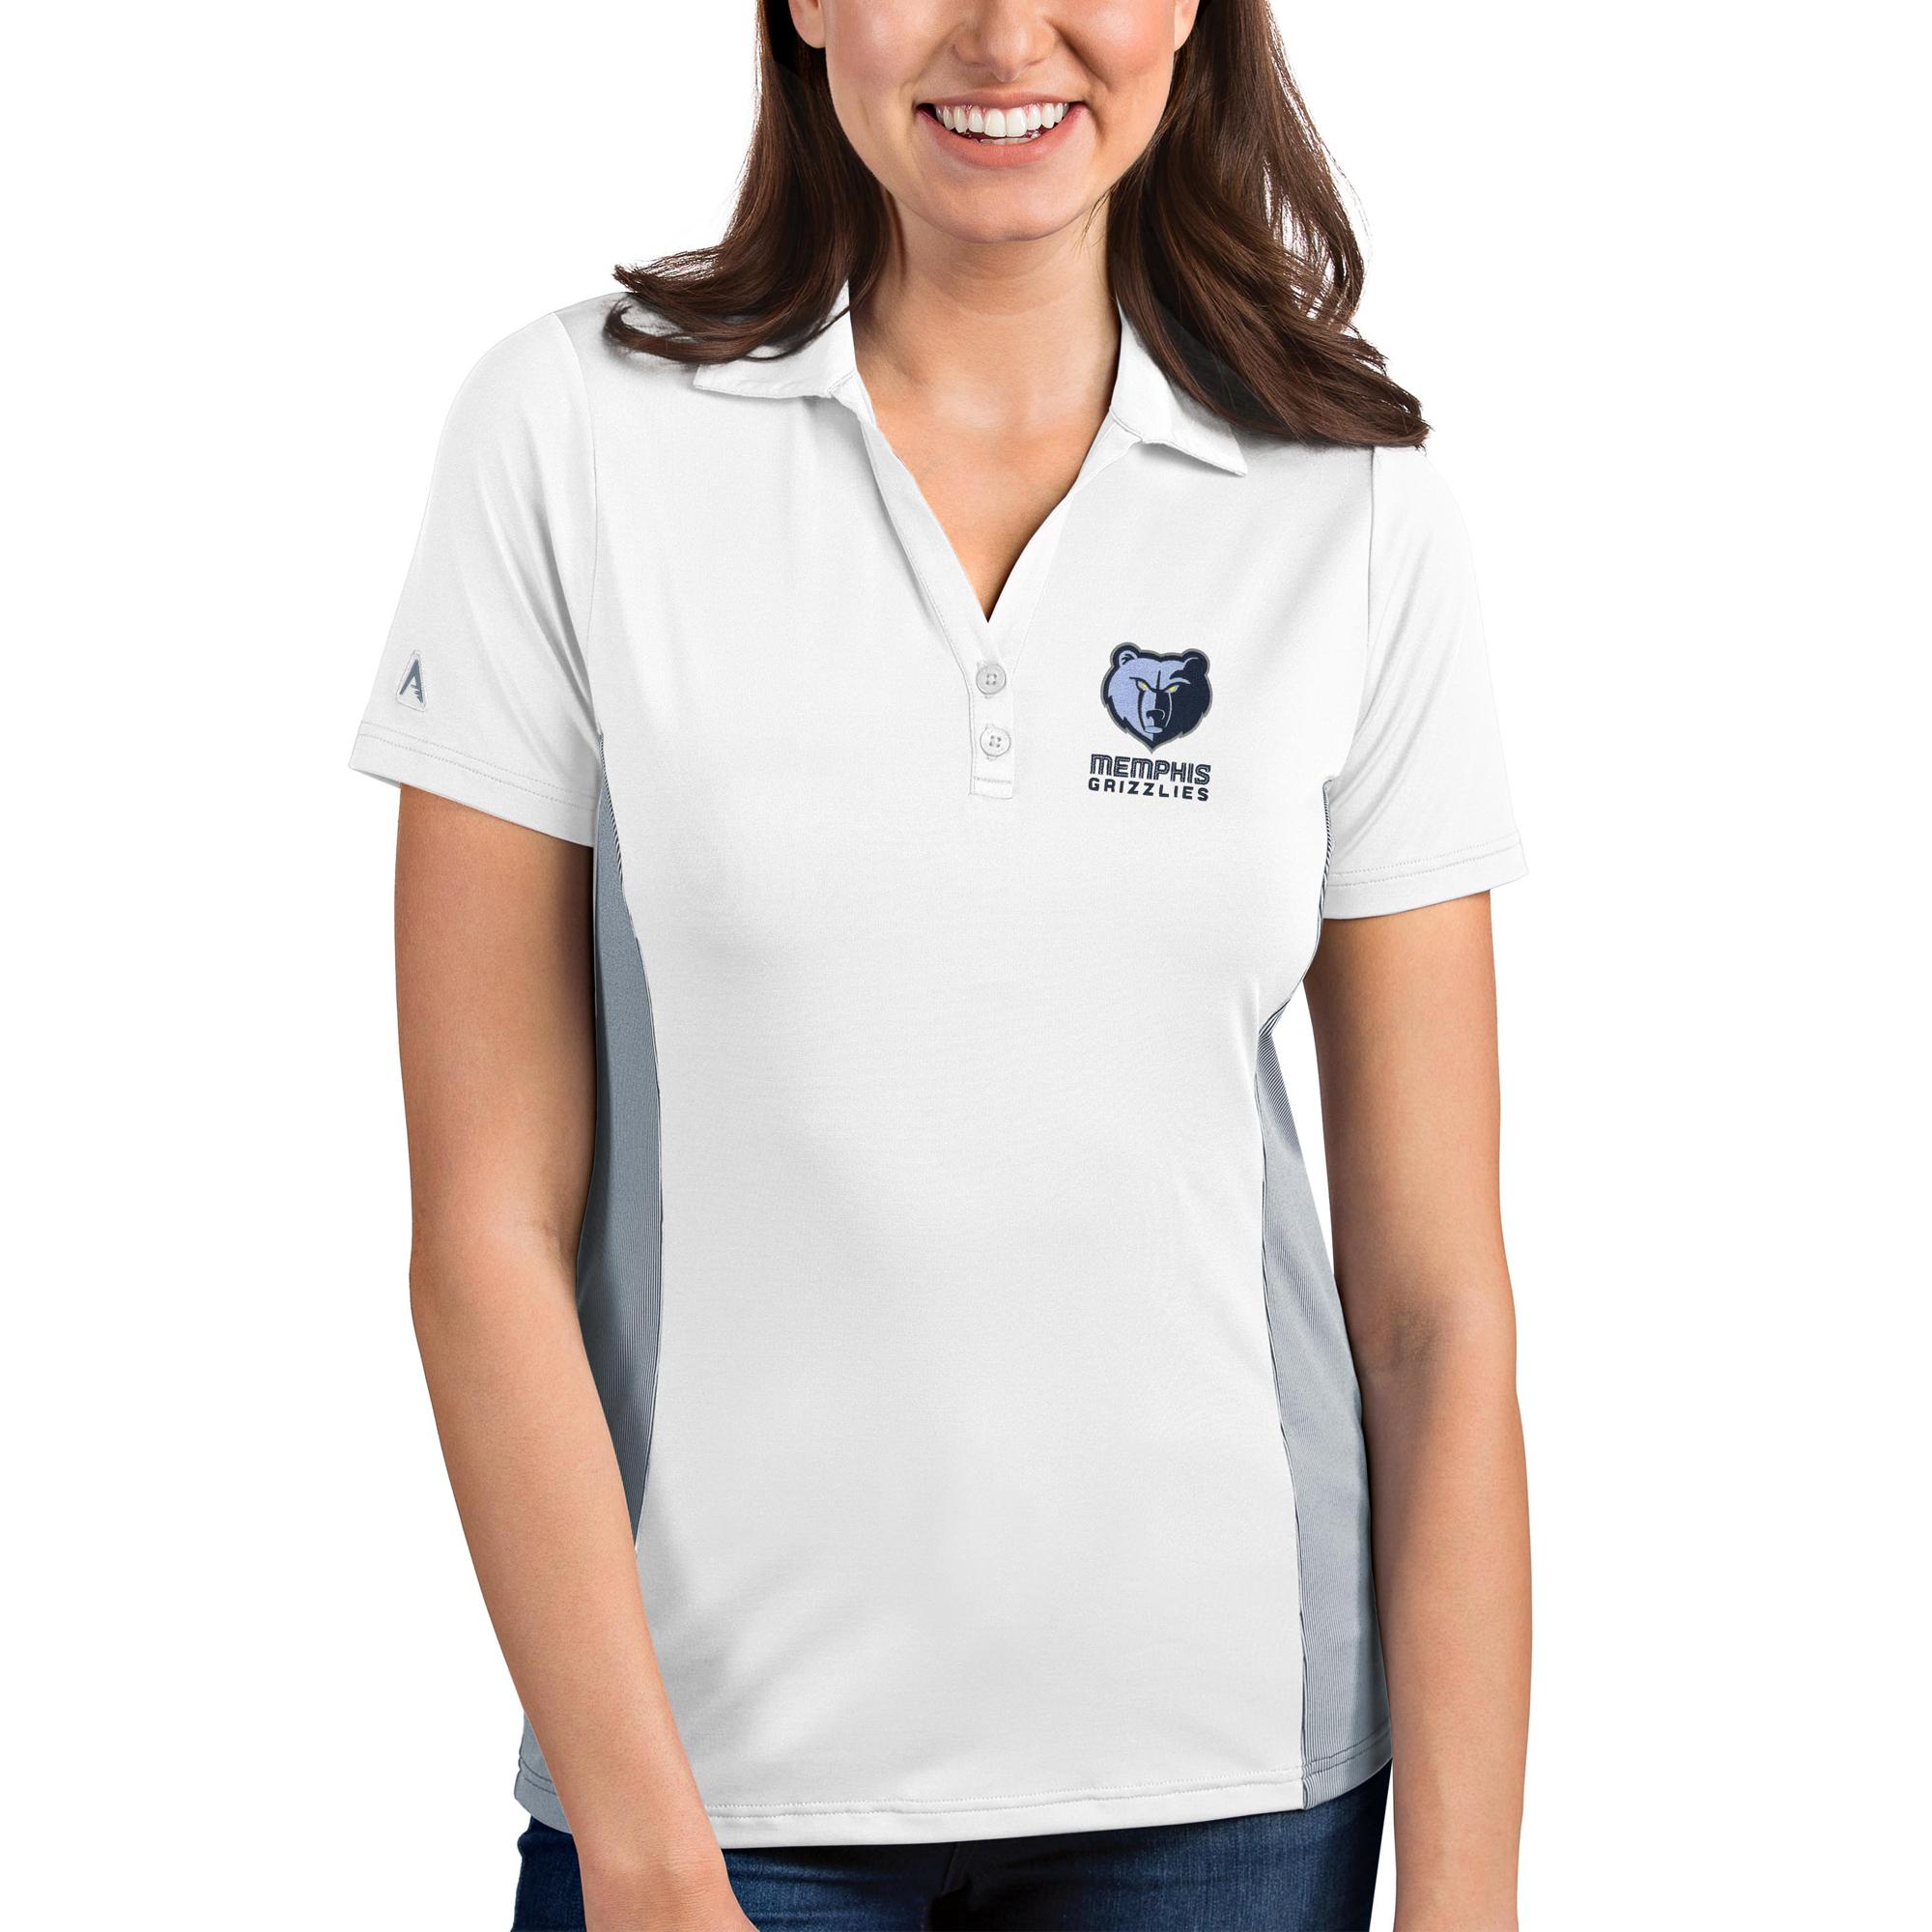 Memphis Grizzlies Antigua Women's Venture Polo - White/Gray